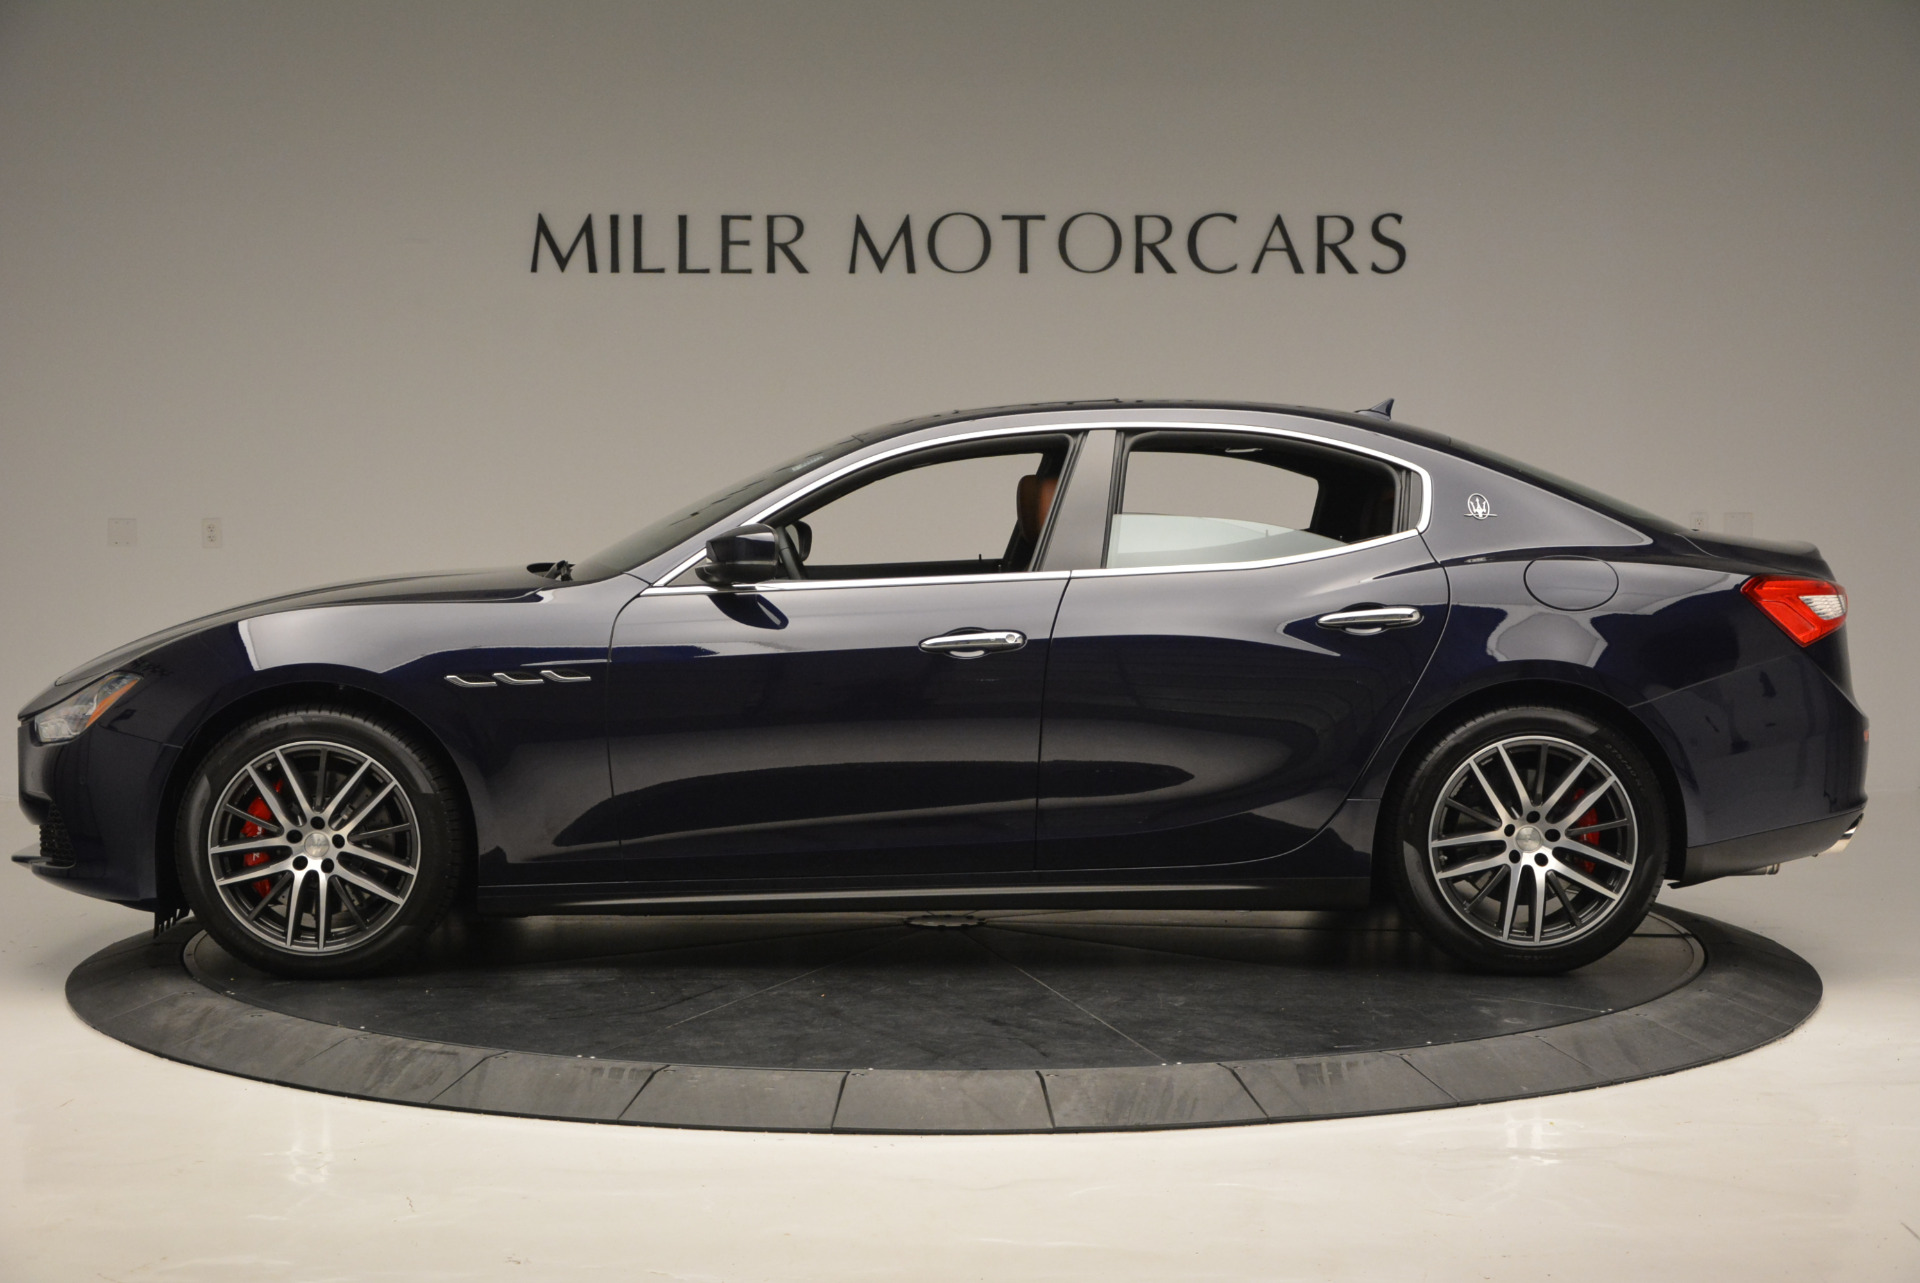 Used 2017 Maserati Ghibli S Q4 - EX Loaner For Sale In Greenwich, CT 567_p3